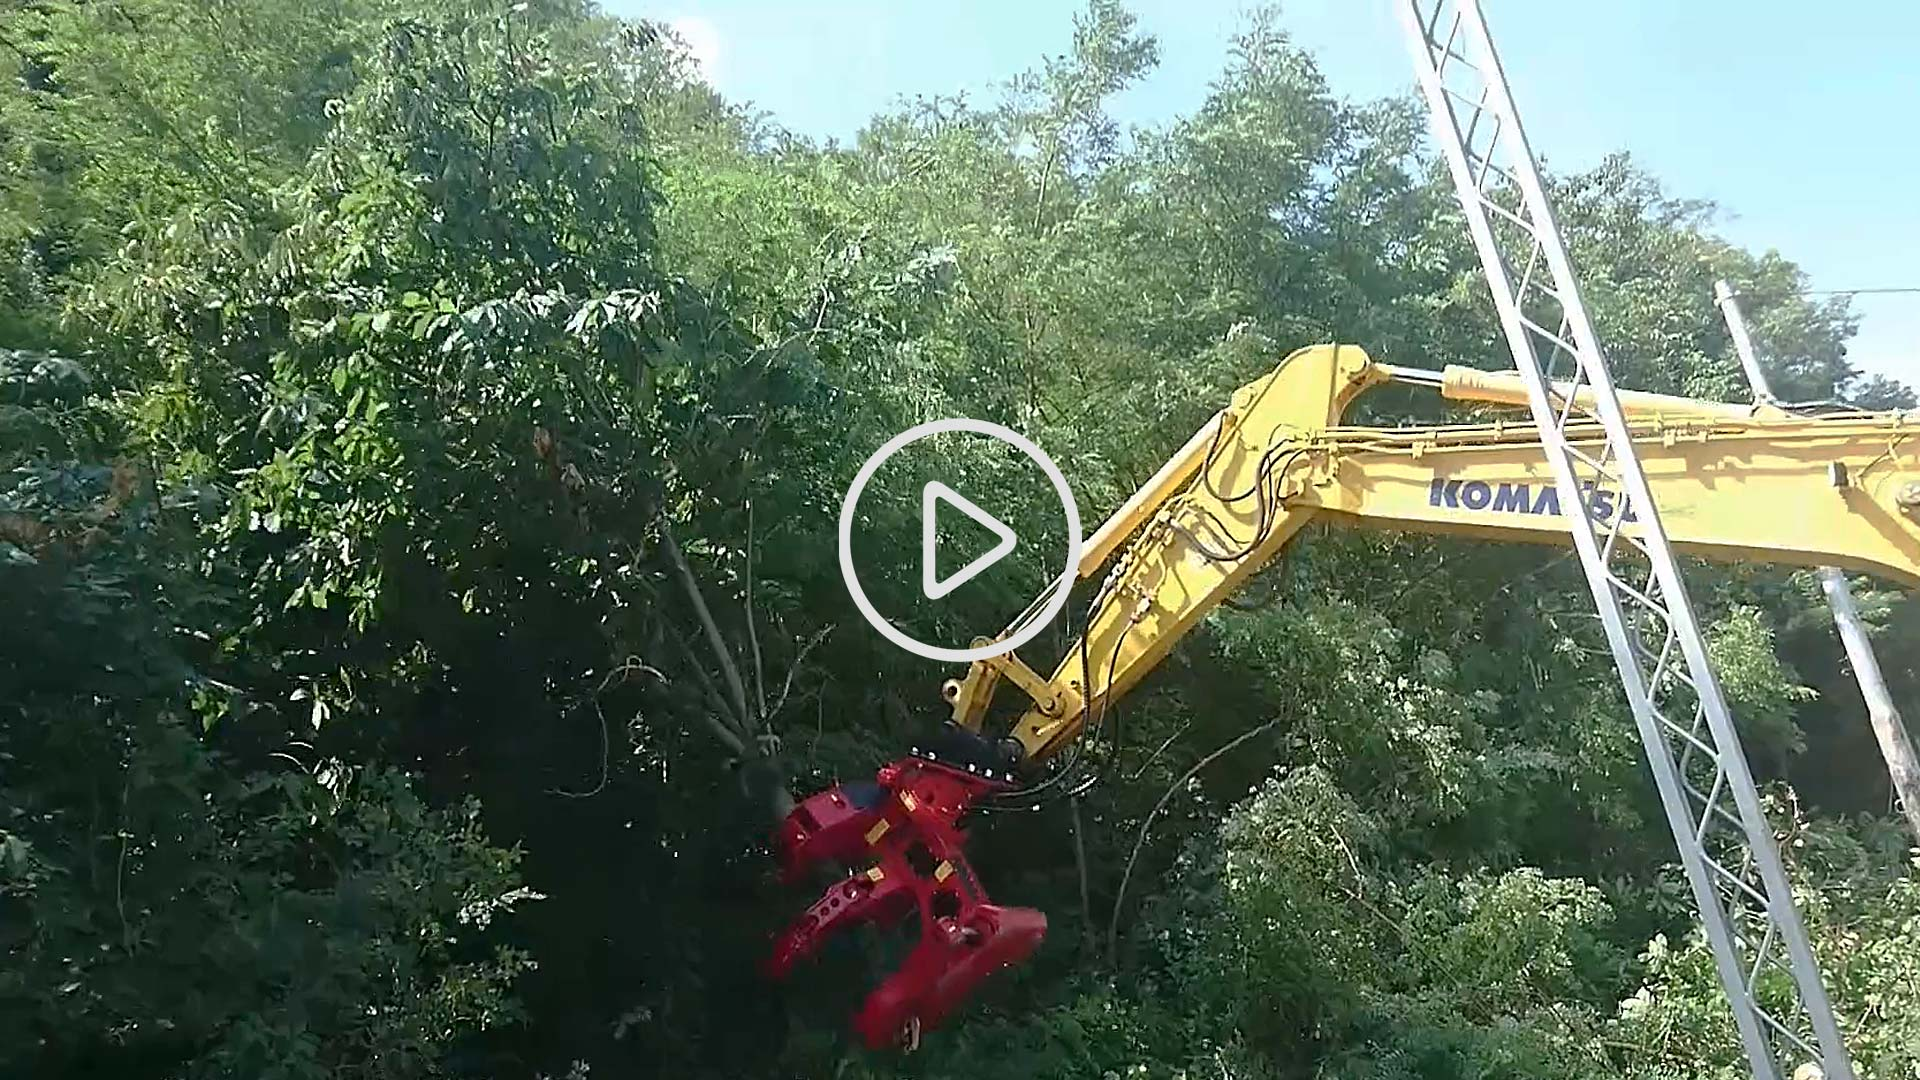 escavatore komatsu pinza forestale deforestatrice